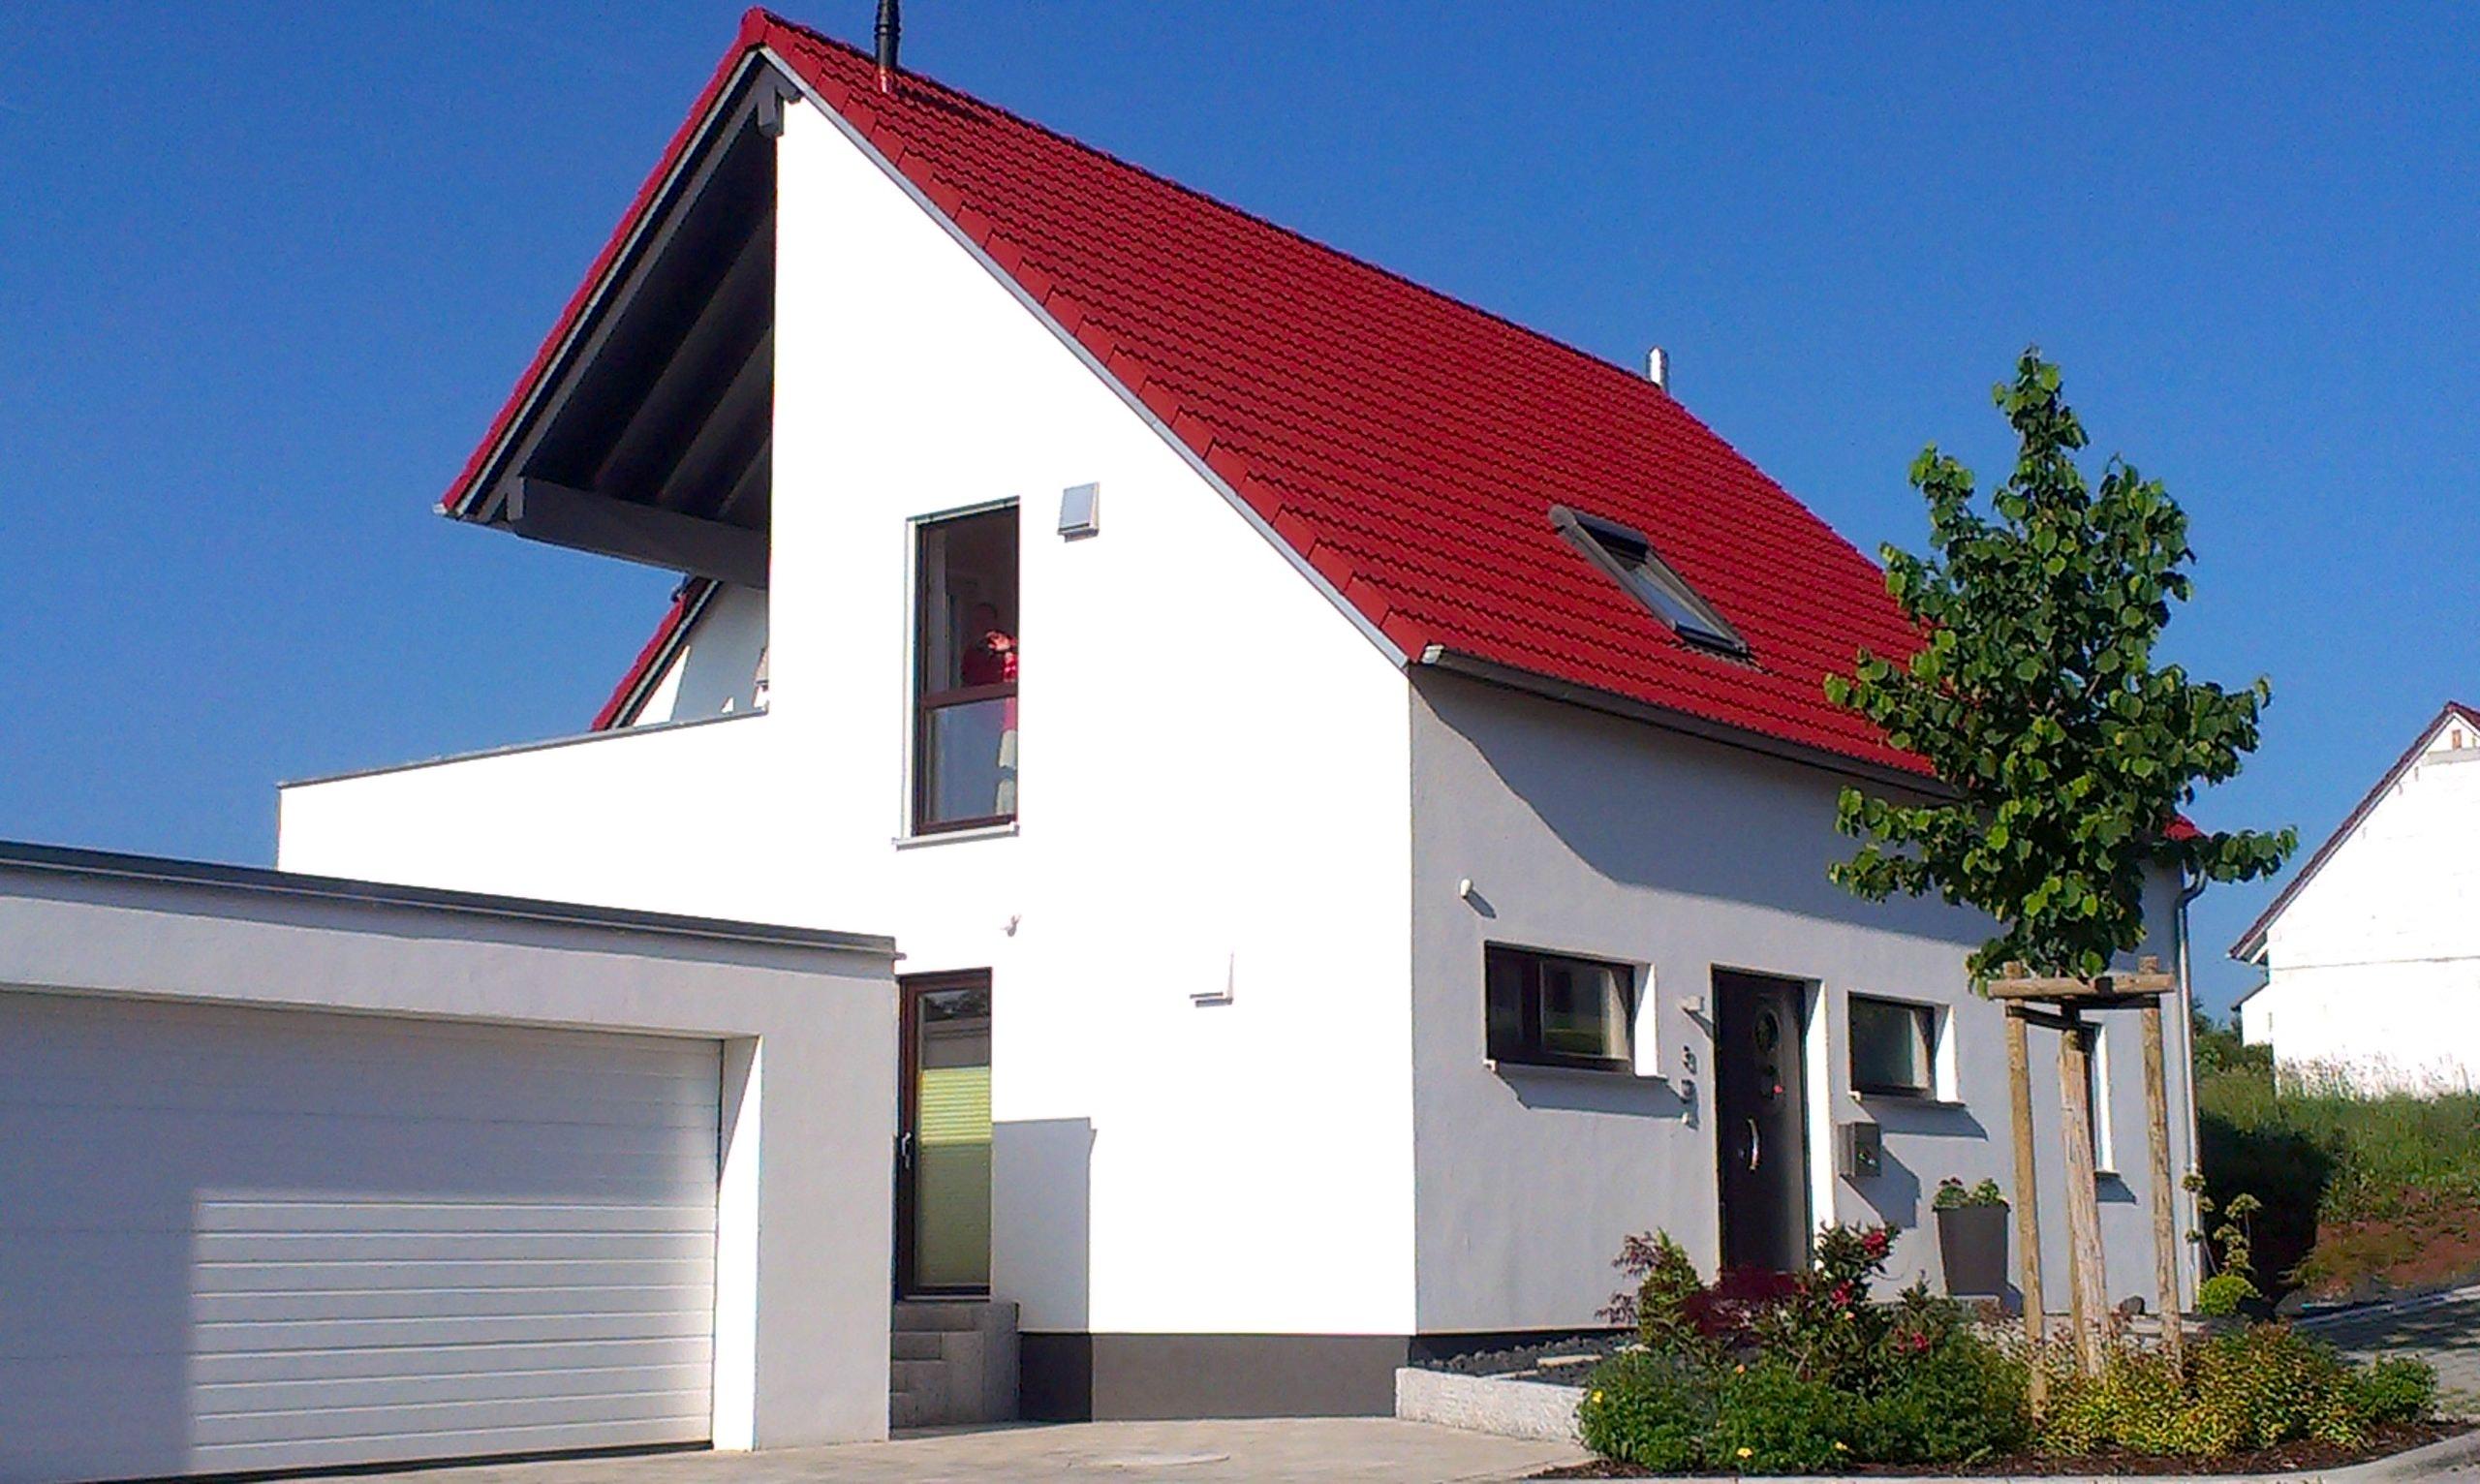 Modell 16 (Passivhaus) exterior 1